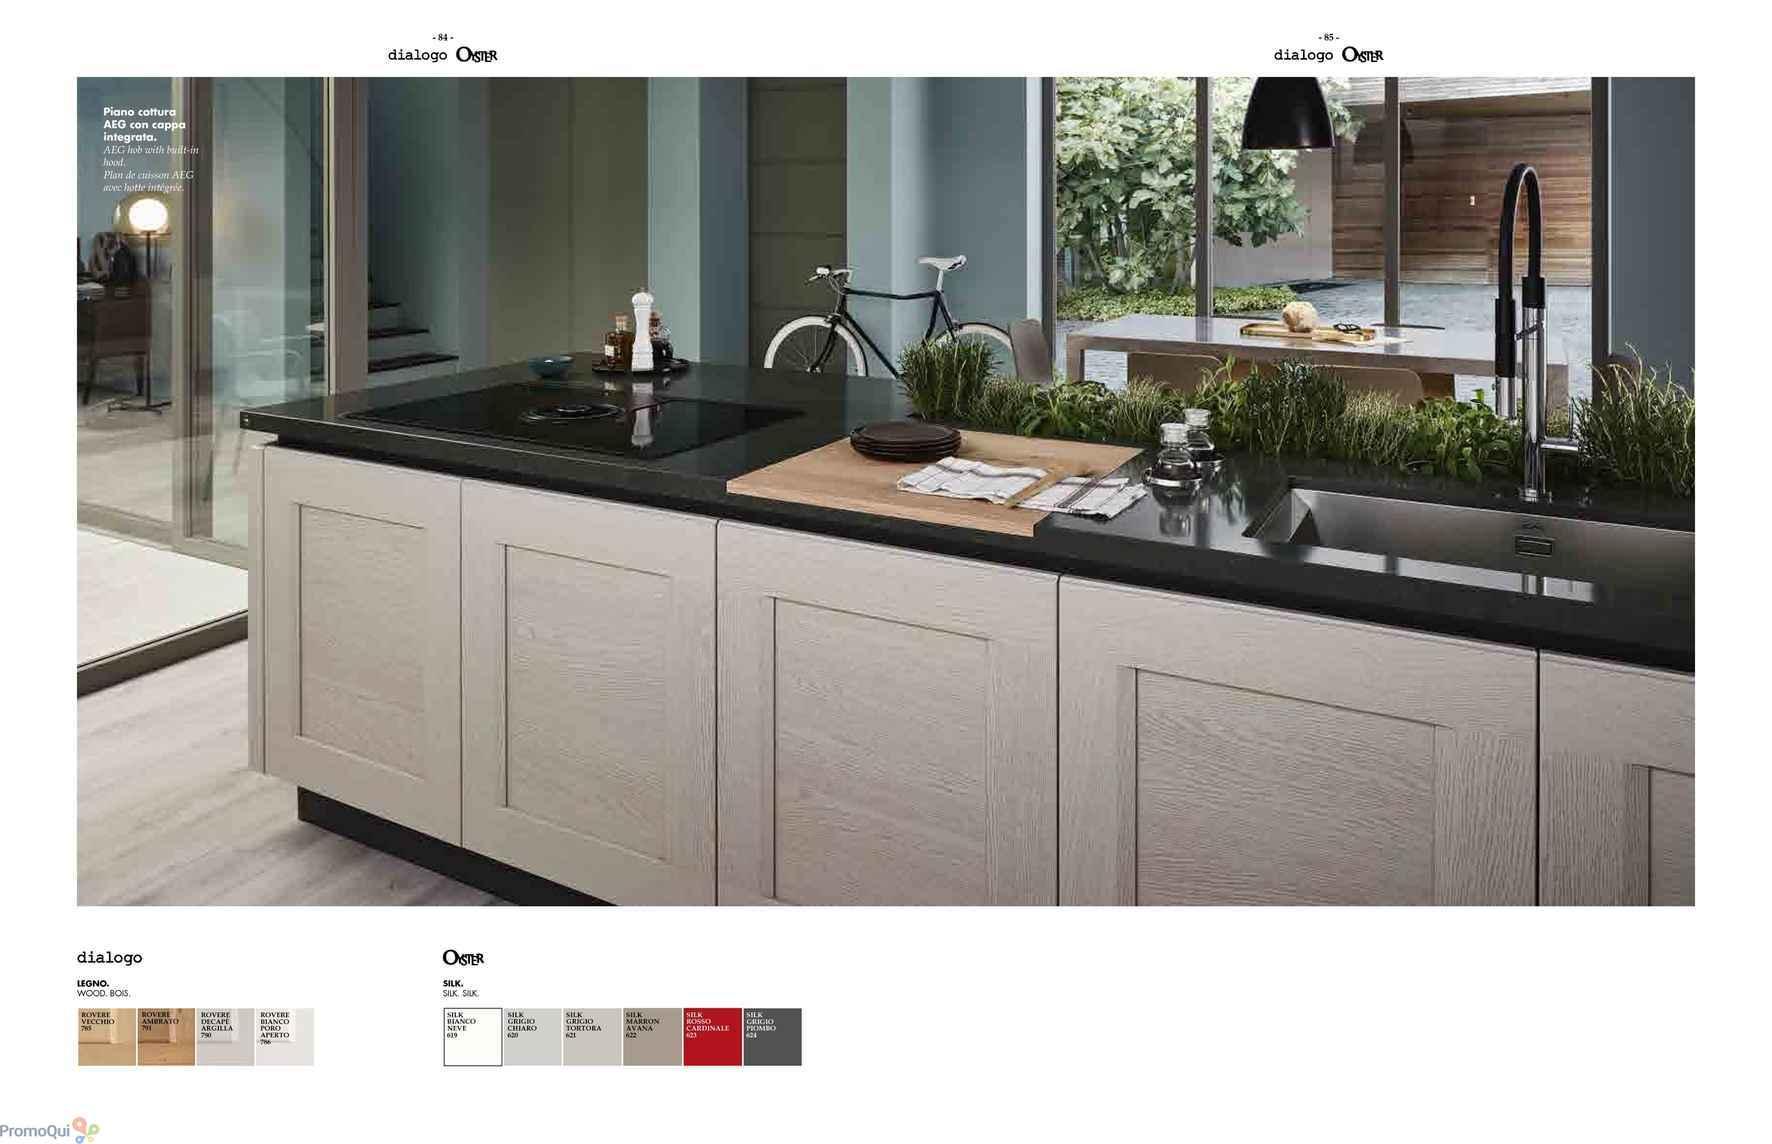 Volantino Veneta Cucine - Cosy home - offerte Arredamento